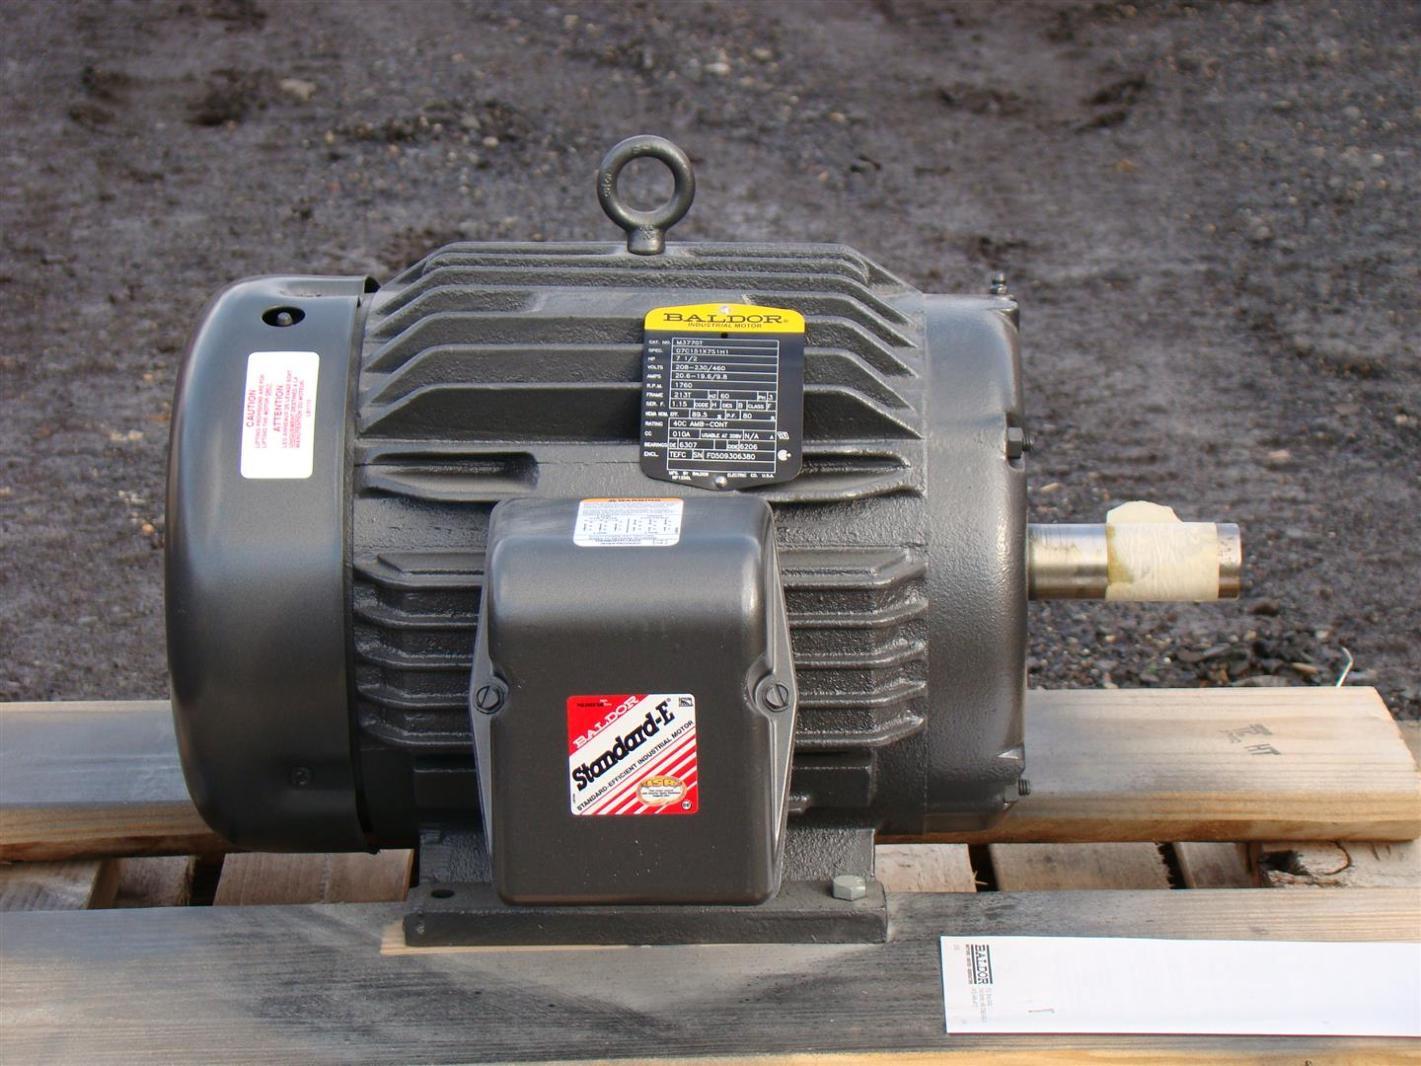 Baldor industrial motor 7 1 2hp 230 460v 19 6 9 8a 1760rpm Baldor industrial motor pump